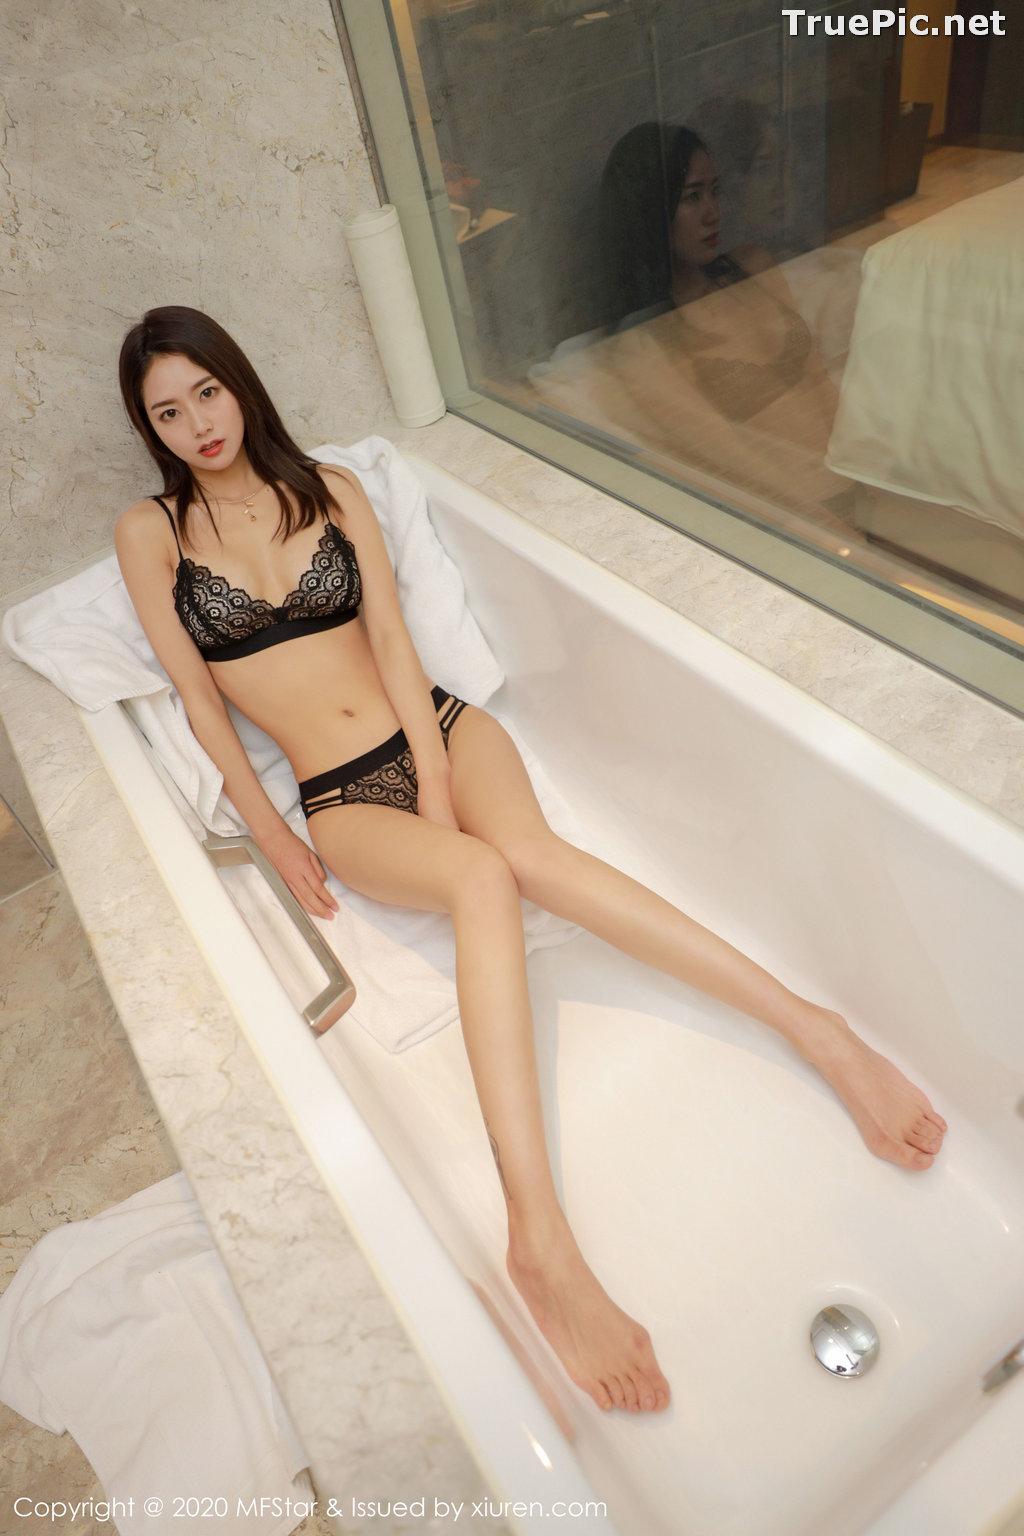 Image MFStar Vol.307 - Chinese Model - Fang Zi Xuan (方子萱) - TruePic.net - Picture-1